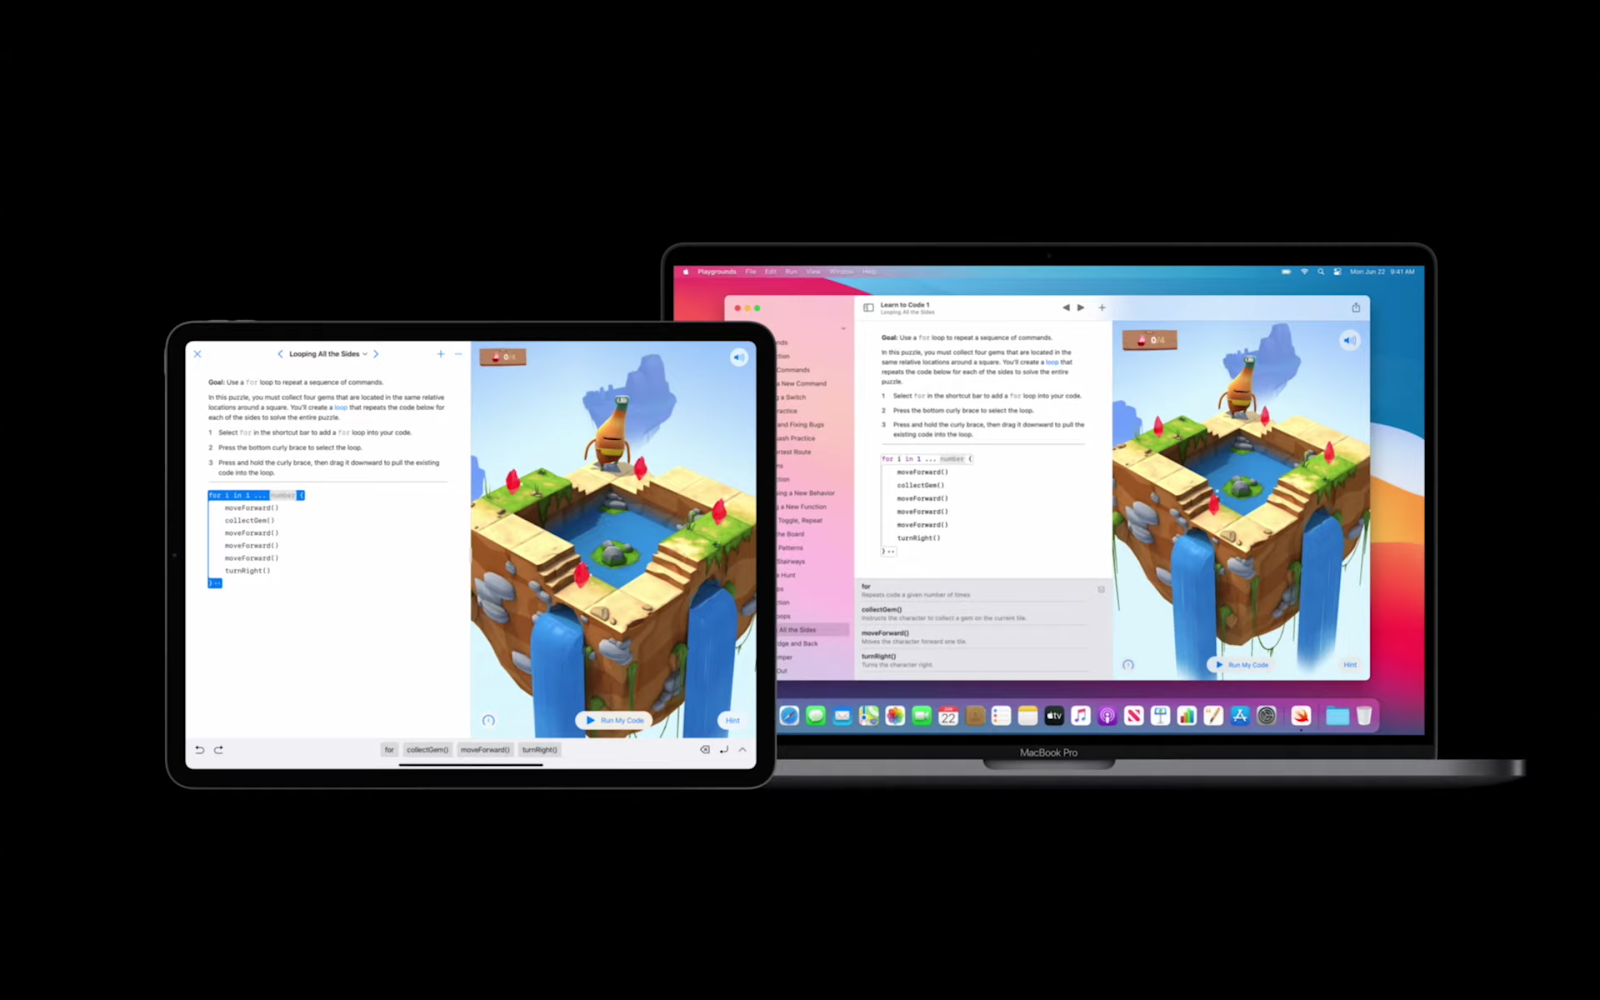 iPadification Big Sur macOS